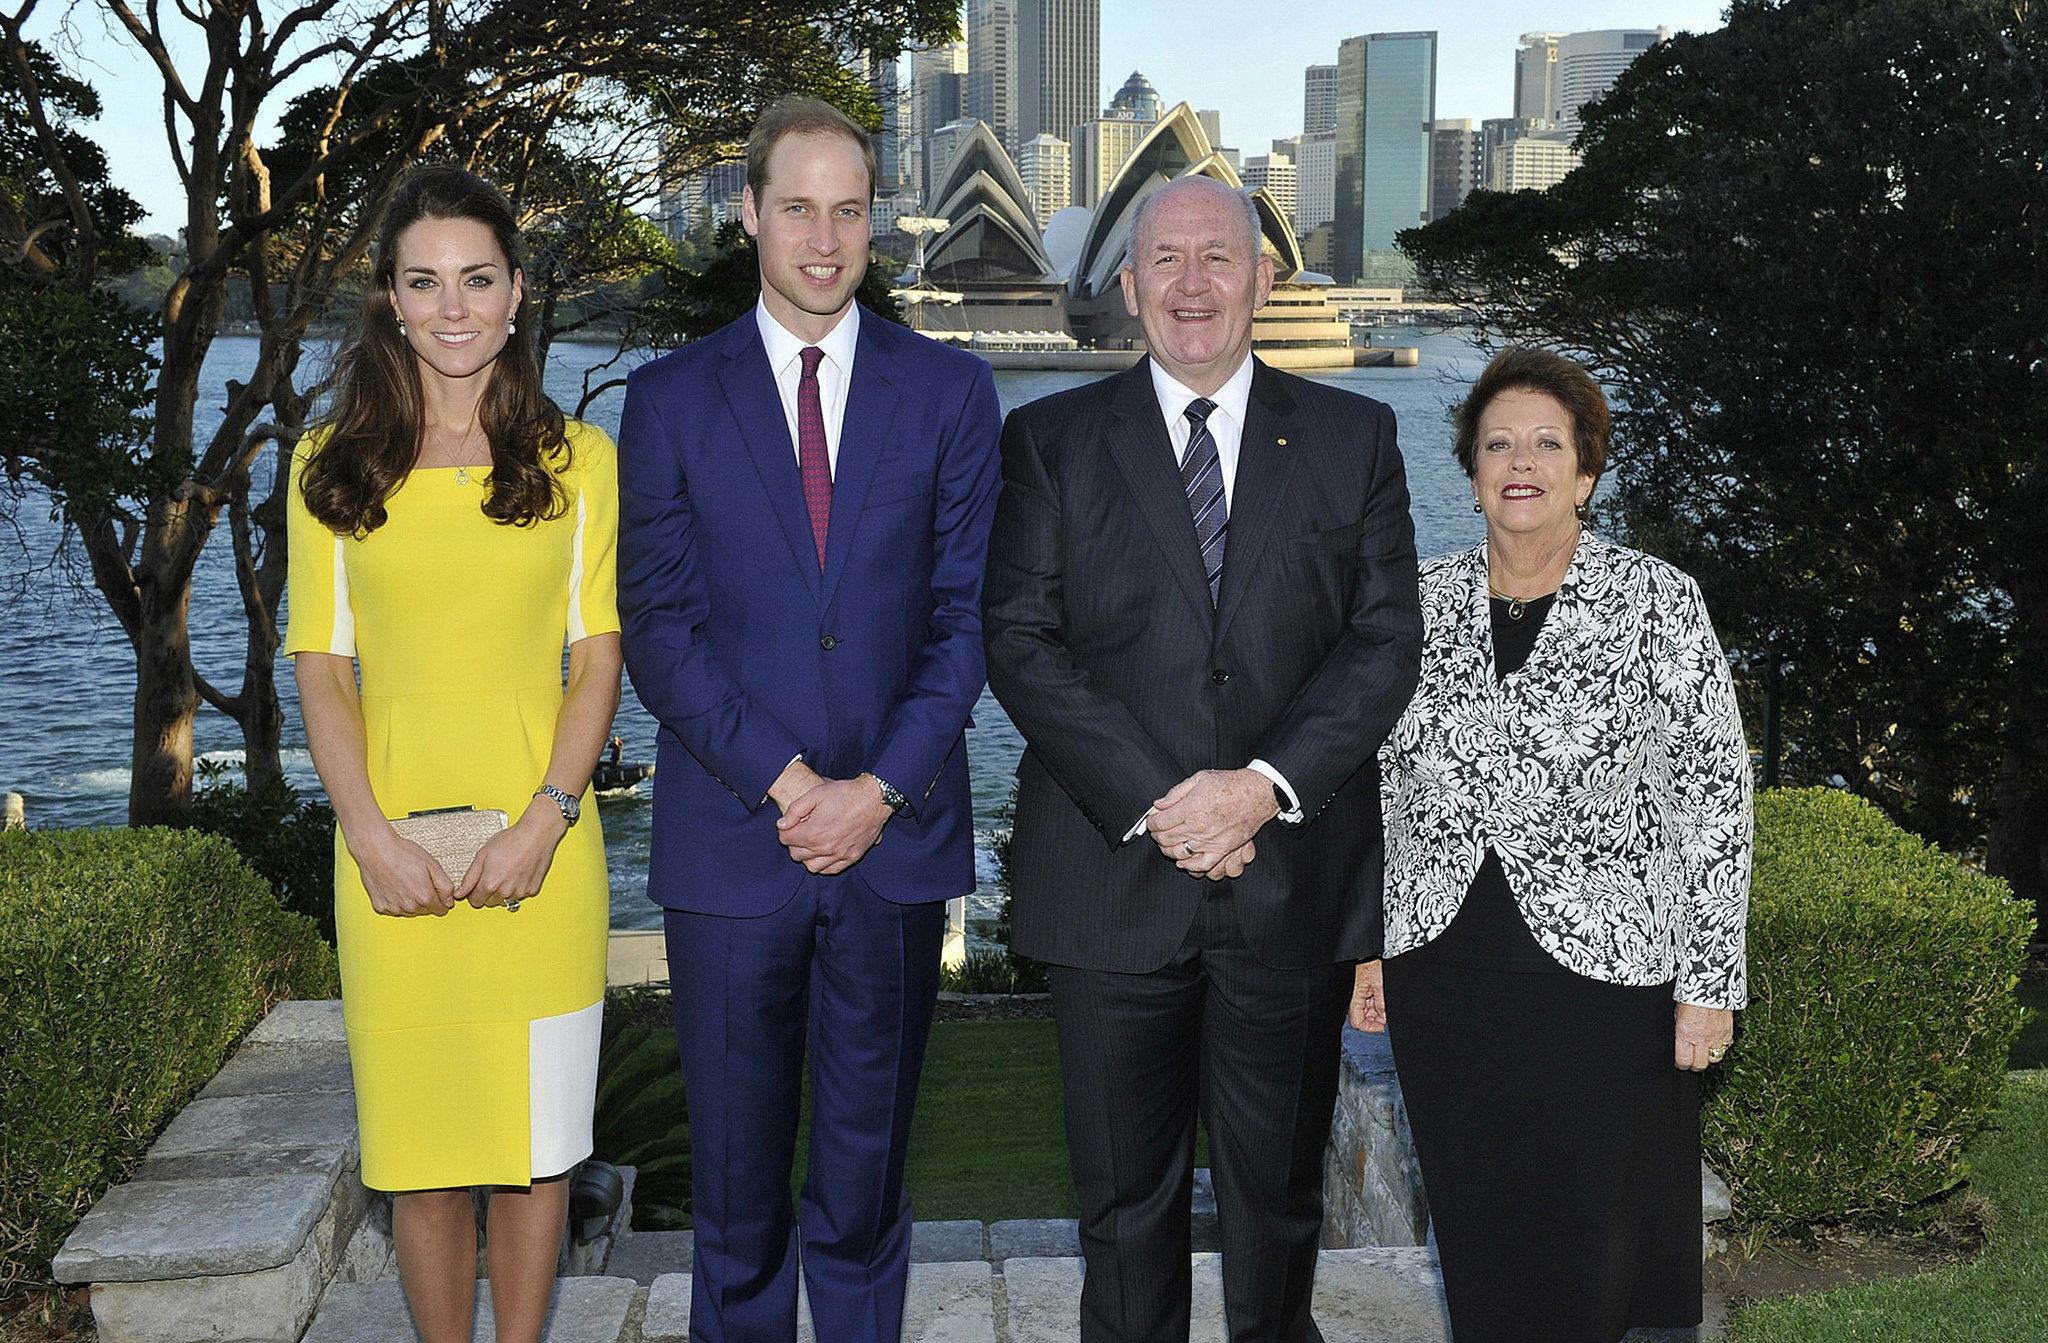 Prince George Brings the Royal Charm to Australia